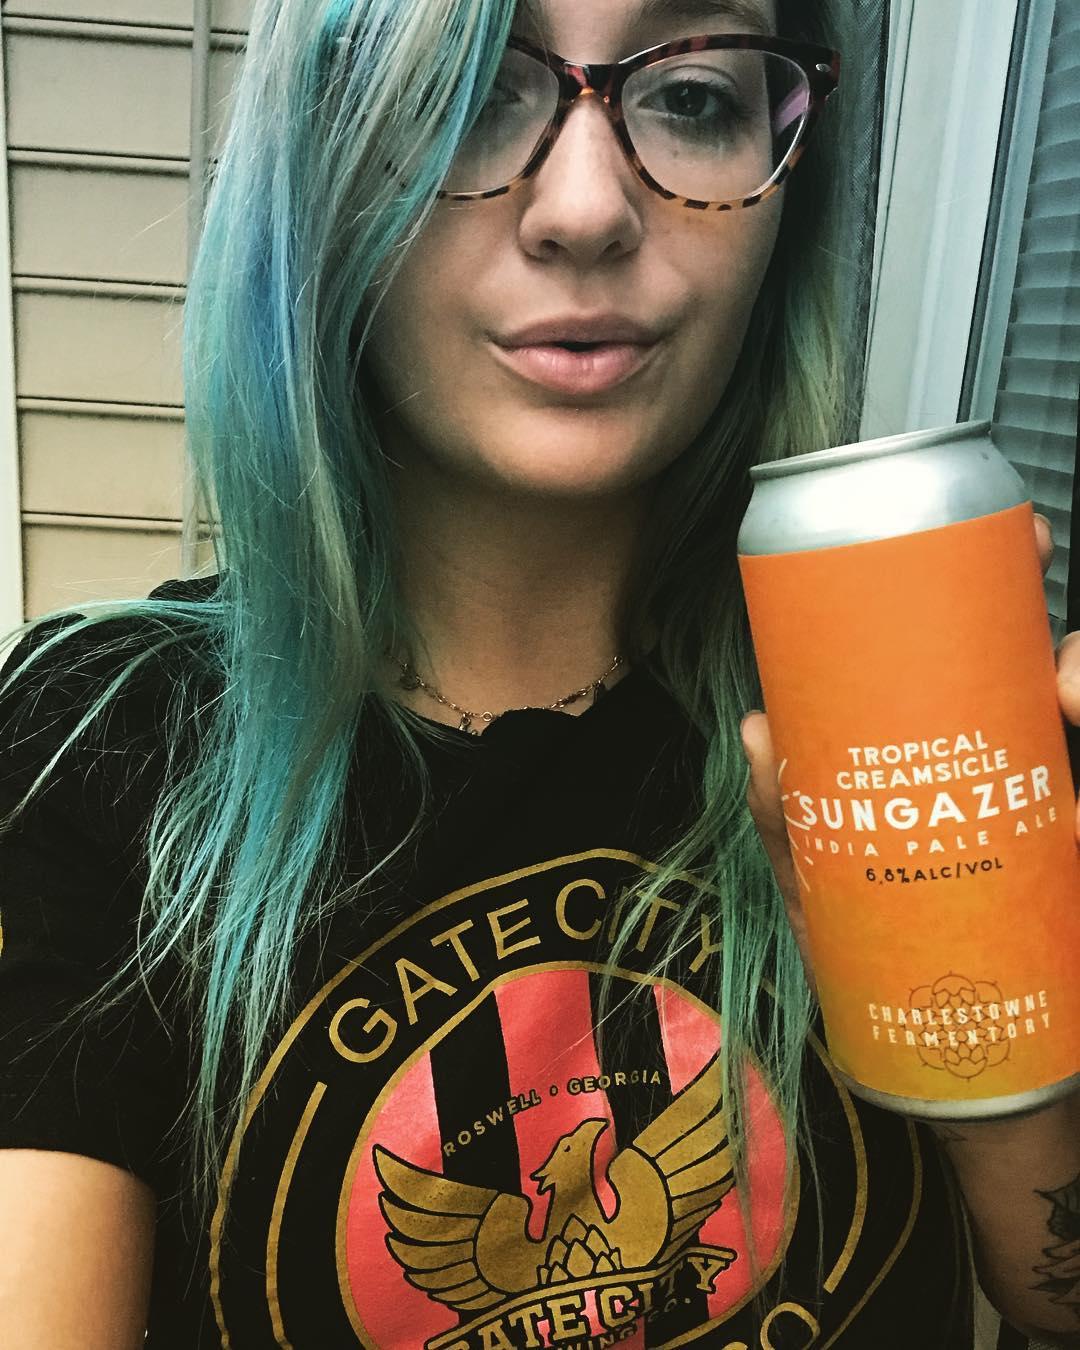 beergirlmeetsworld - @beergirlmeetsworld